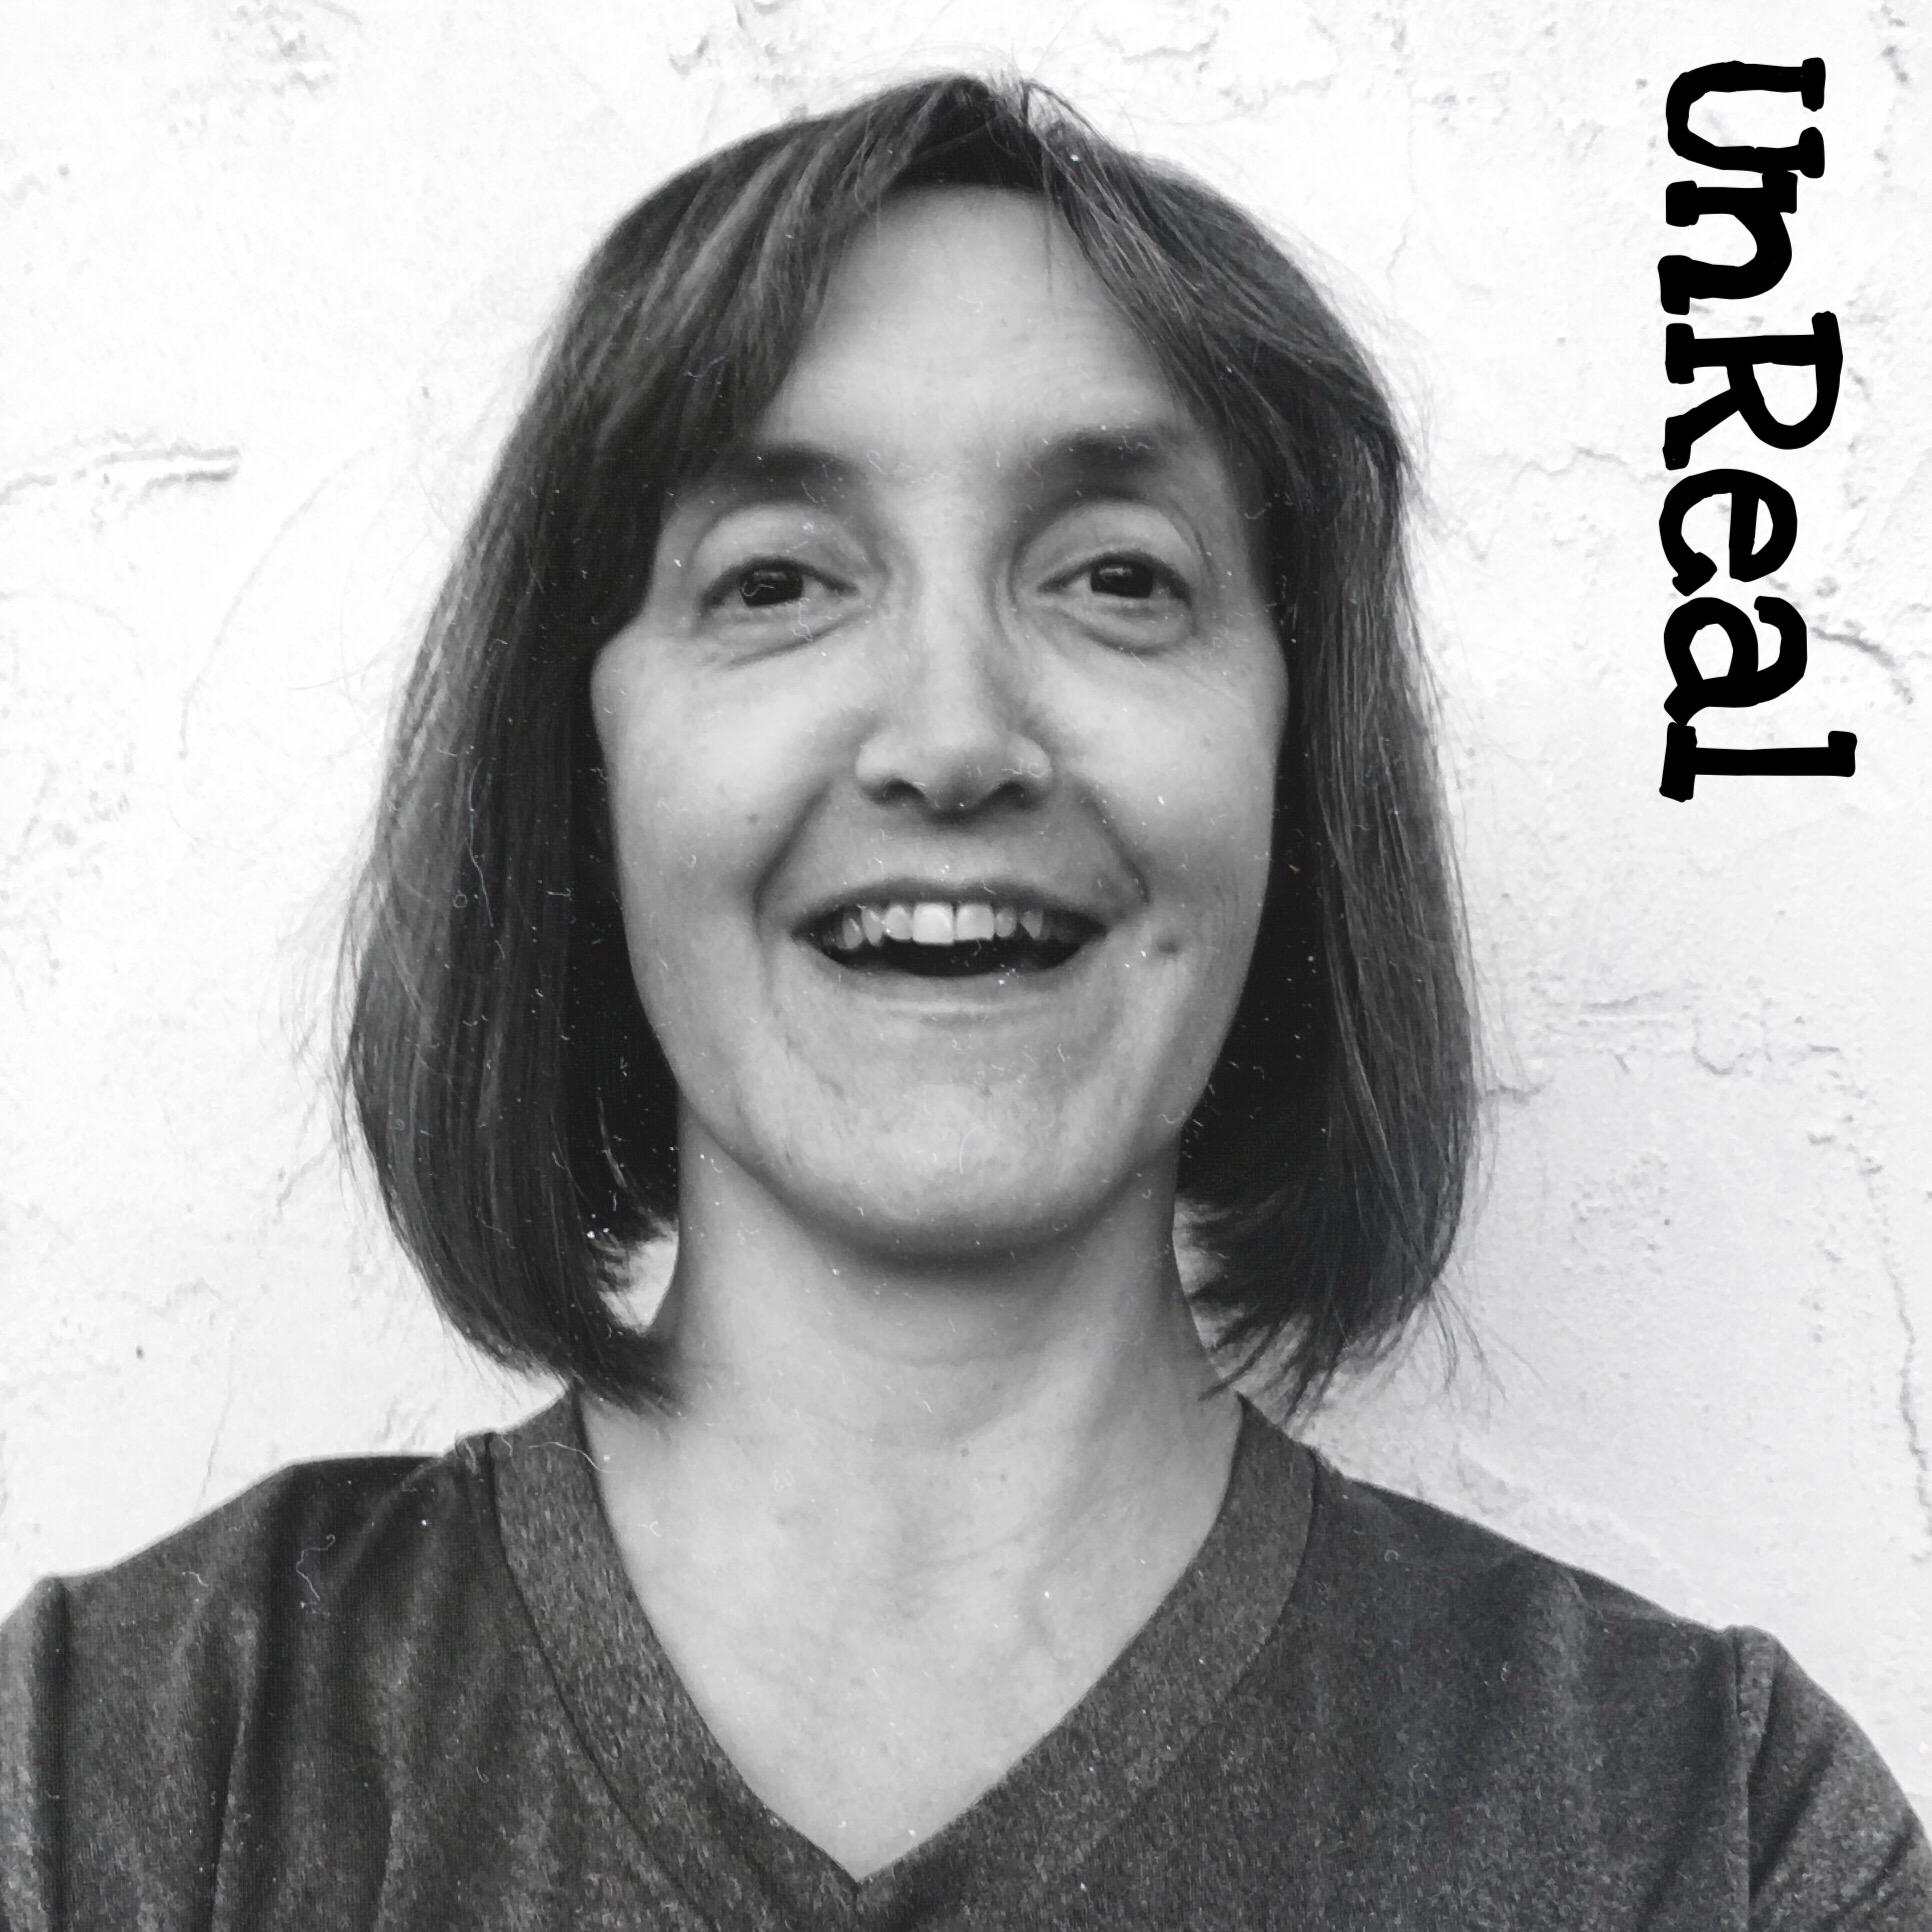 Tina Paraventi